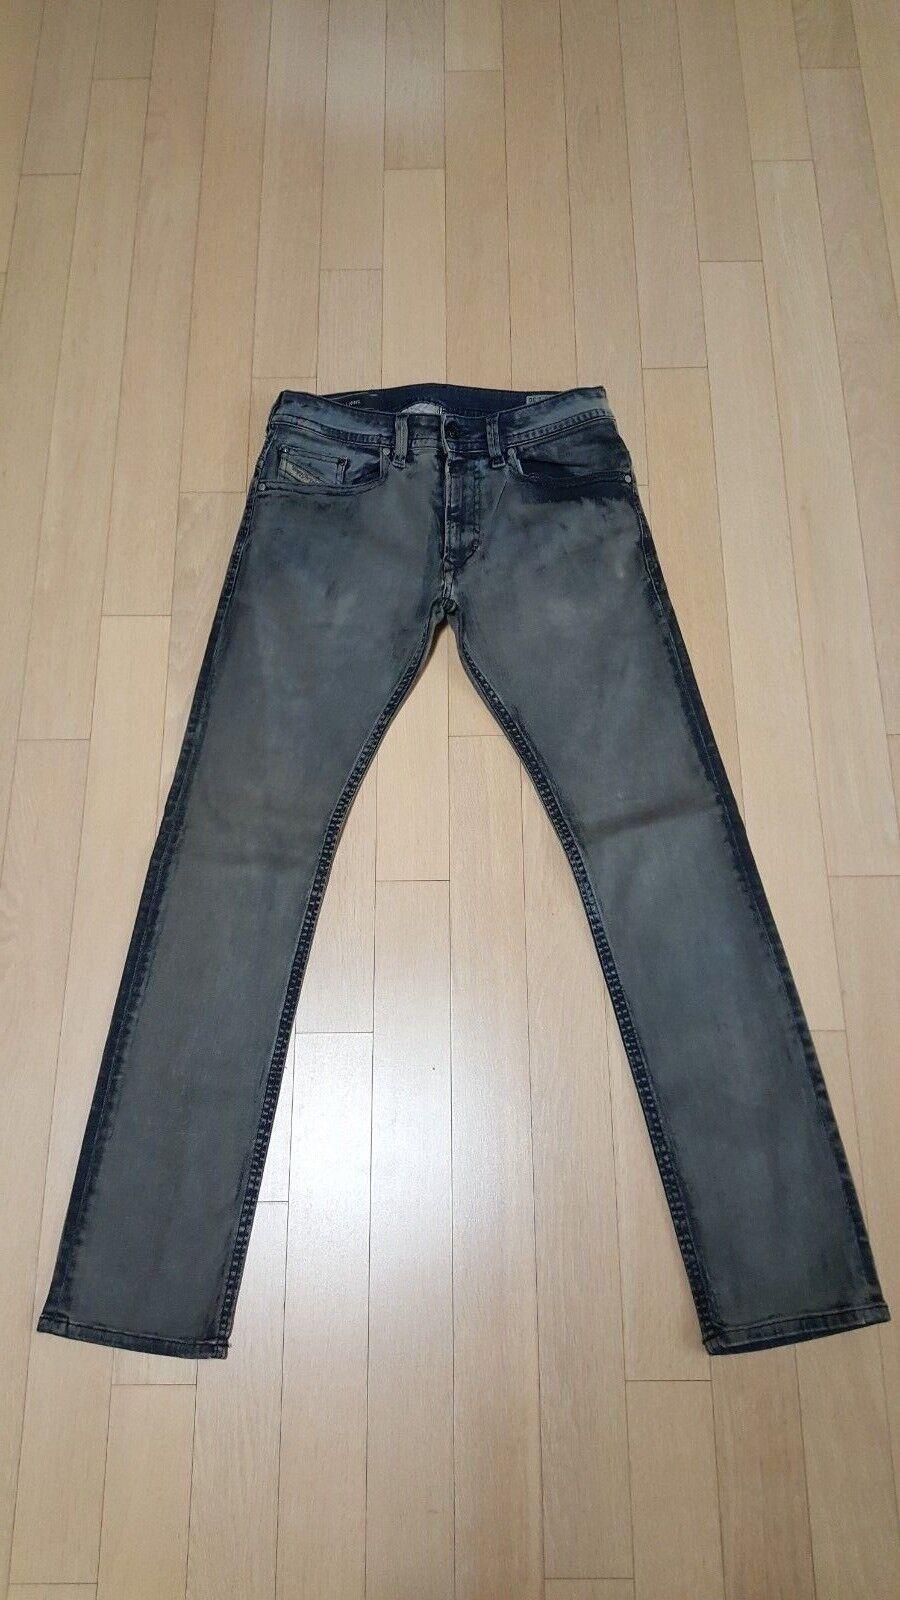 Diesel Thavar  820d 100% Auténtico Delgado Jeans Ajustados 29x30  saludable